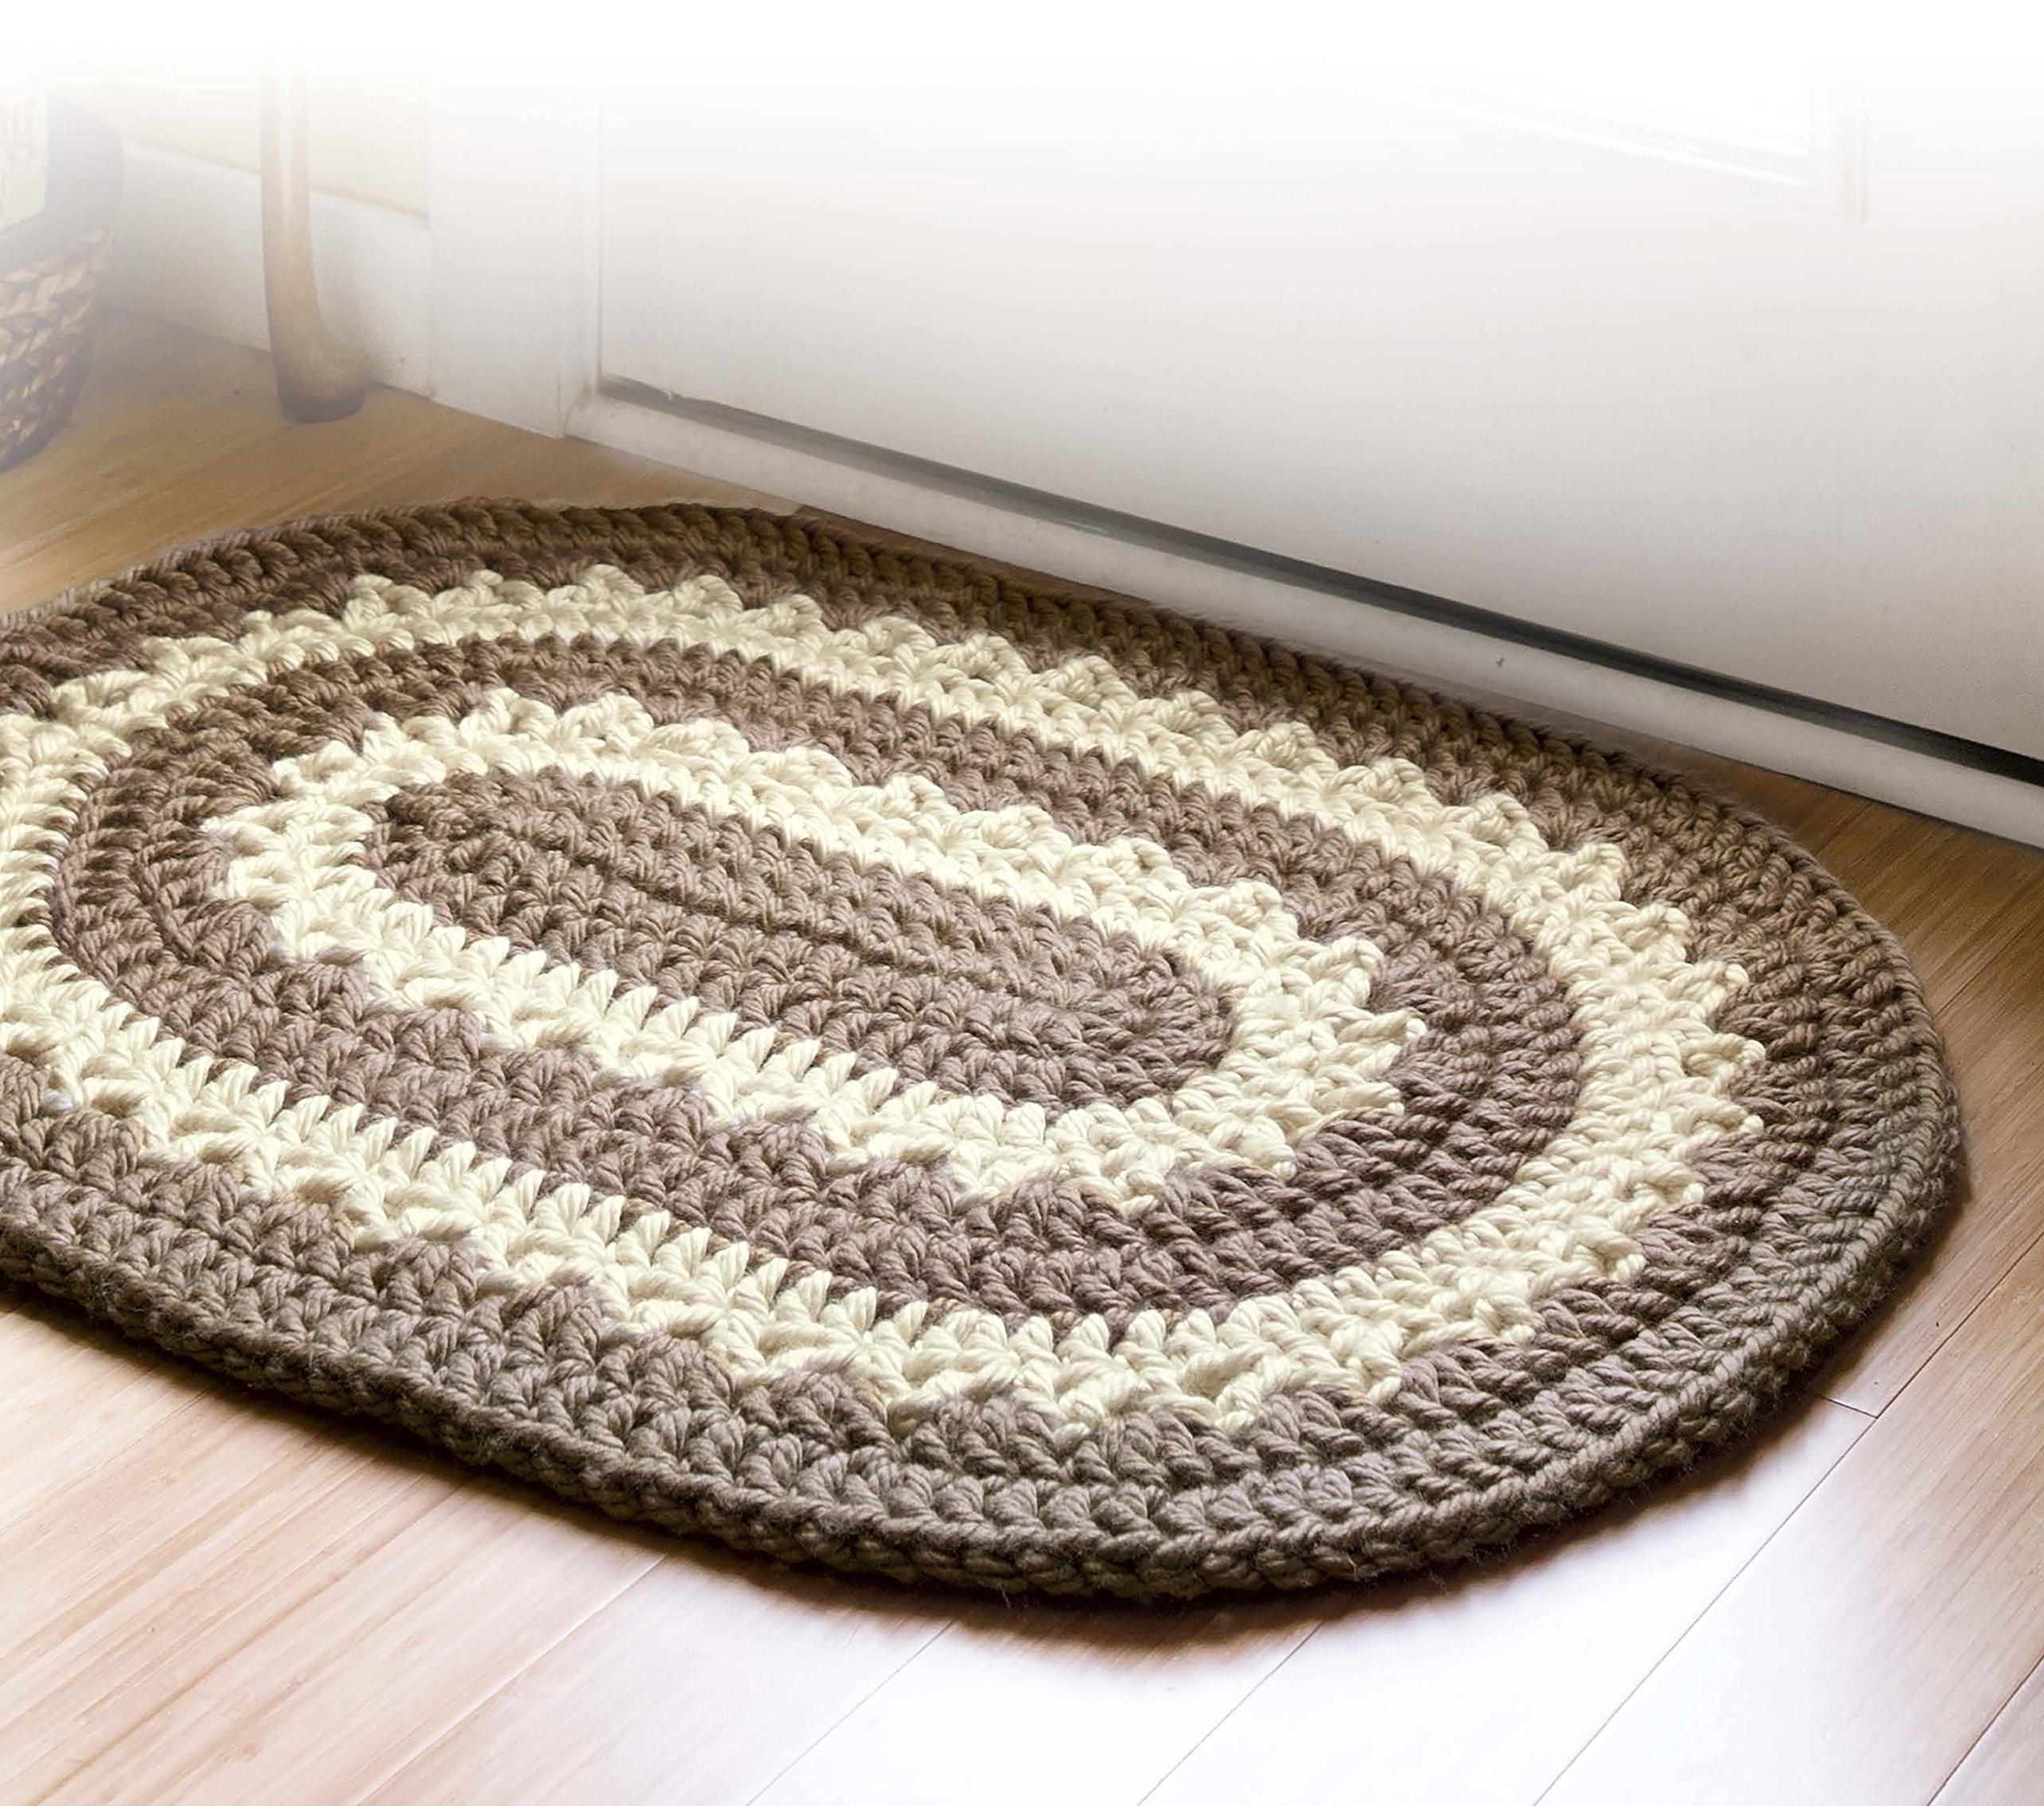 3 Motifs of Easy Crochet Oval Rug Pattern Crochet Rug Patterns 1000lives